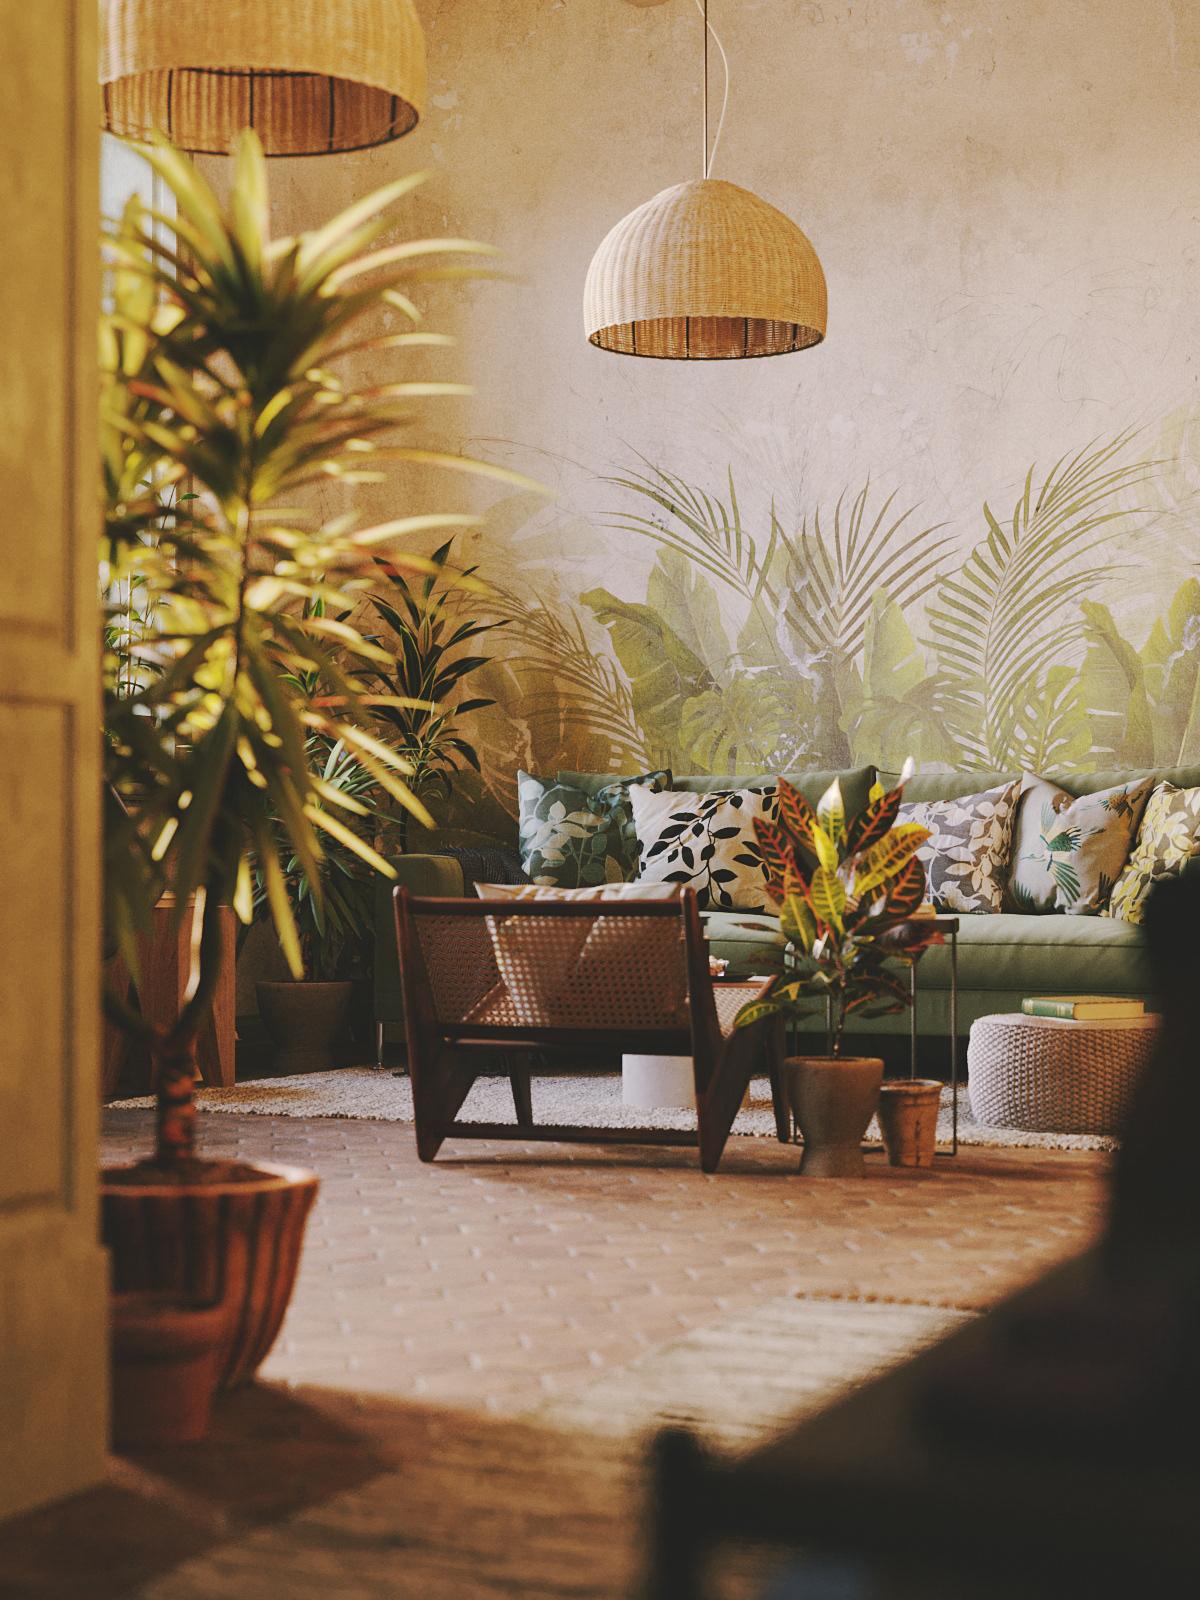 3dsmax architecture corona renderer Interior plants